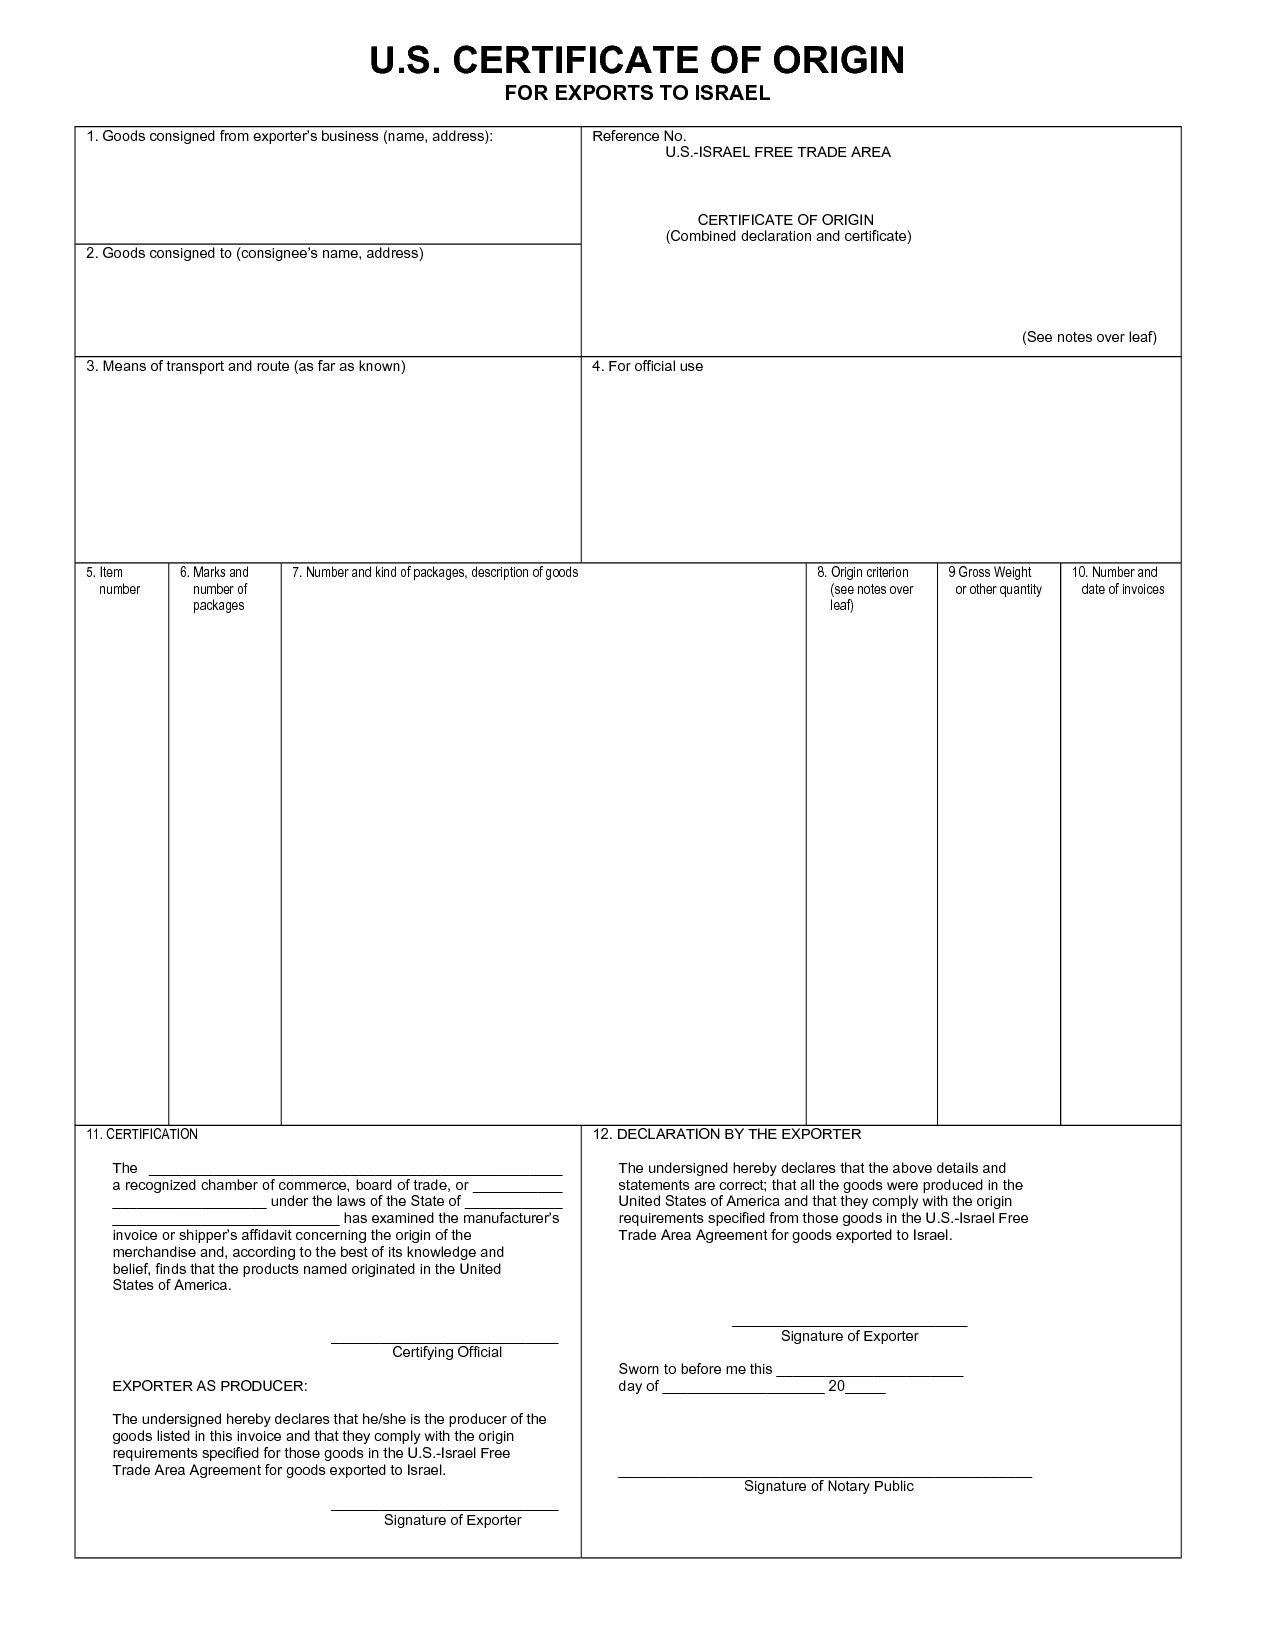 The Marvelous Certificate Of Origin Template Www Dhoc Tk Throughout Certificate Of Origin Certificate Templates Certificate Of Origin Professional Templates Blank certificate of origin template